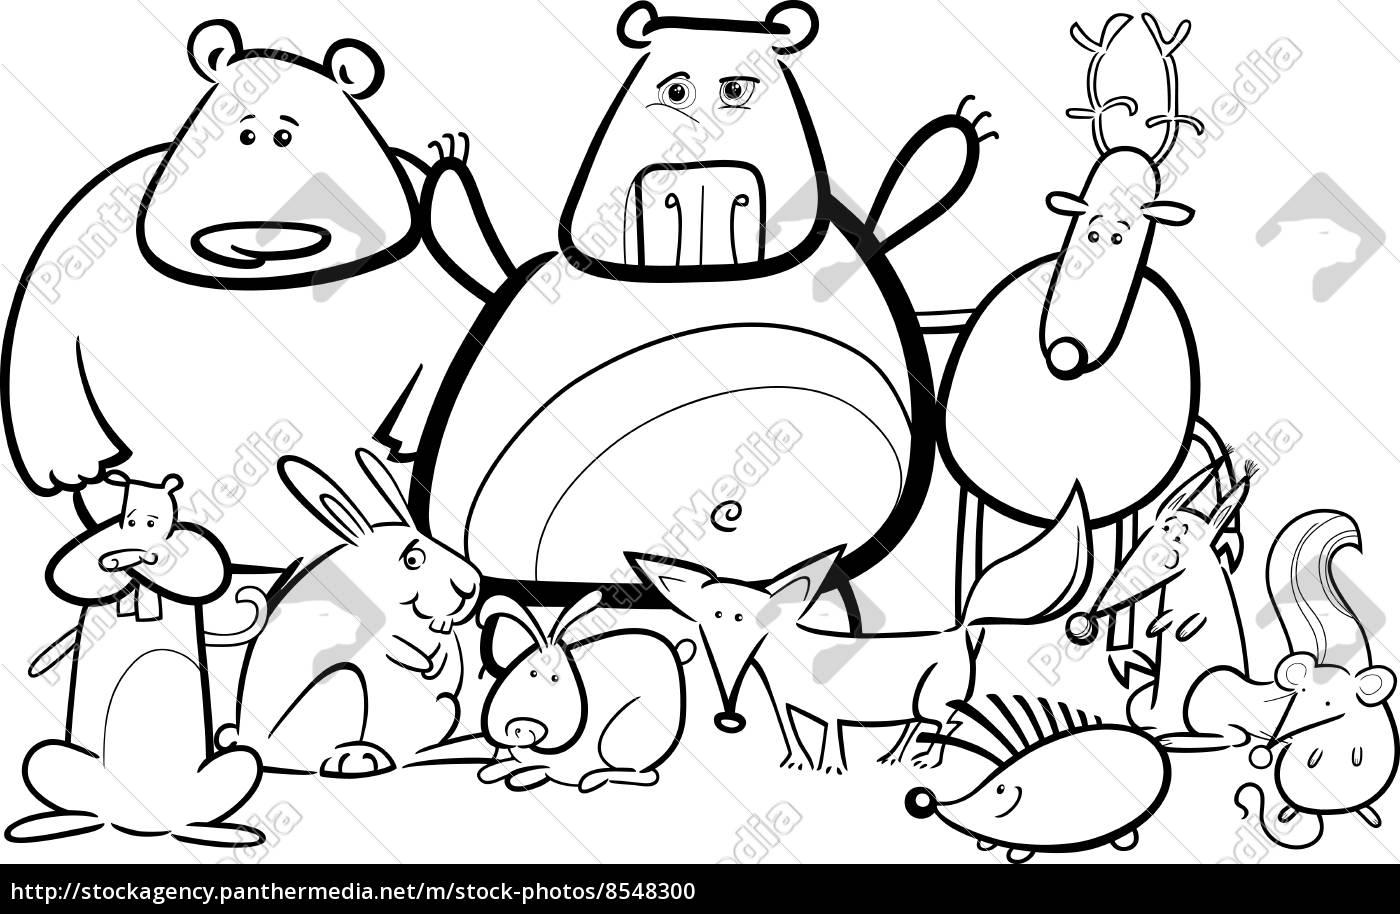 dibujo animado grupo de animales salvajes para colorear - Stockphoto ...